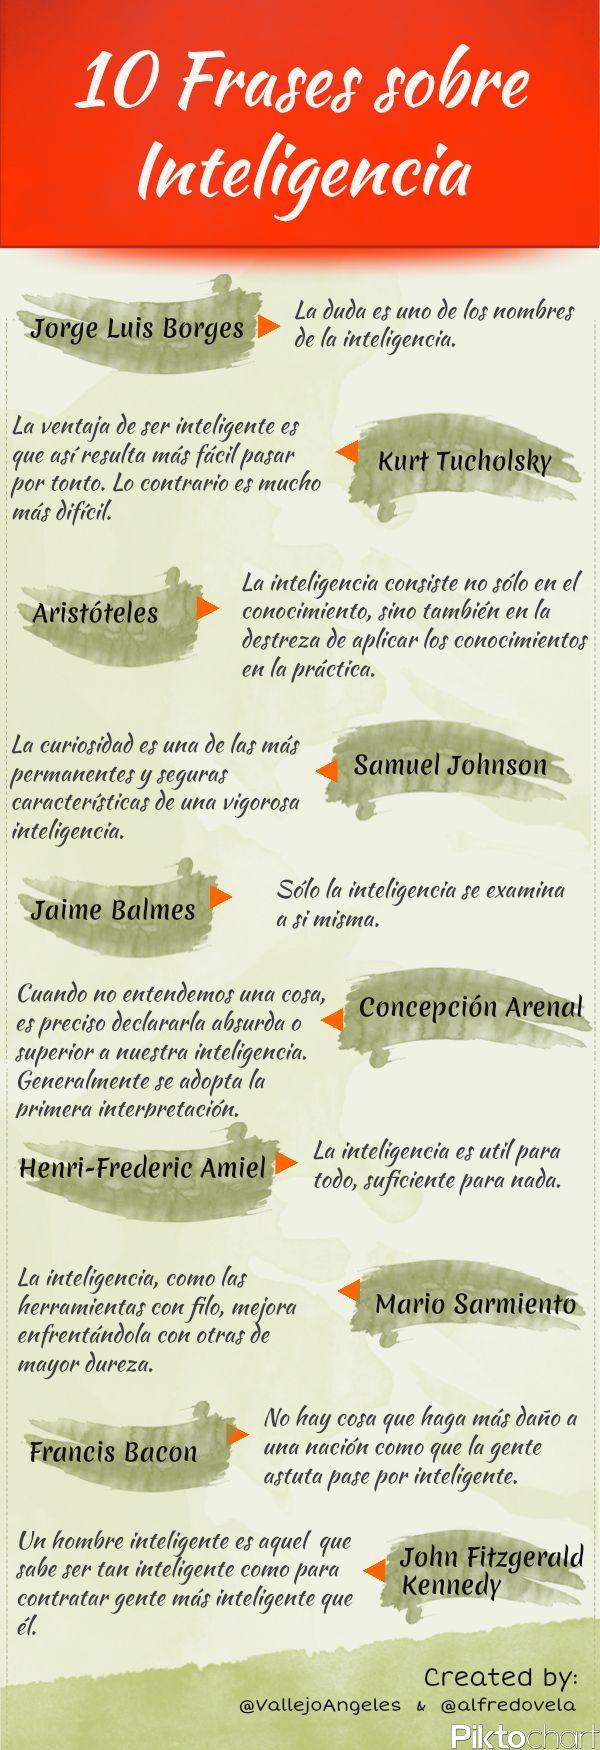 10 citas célebres sobre inteligencia #infografia #infographic #citas #quotes